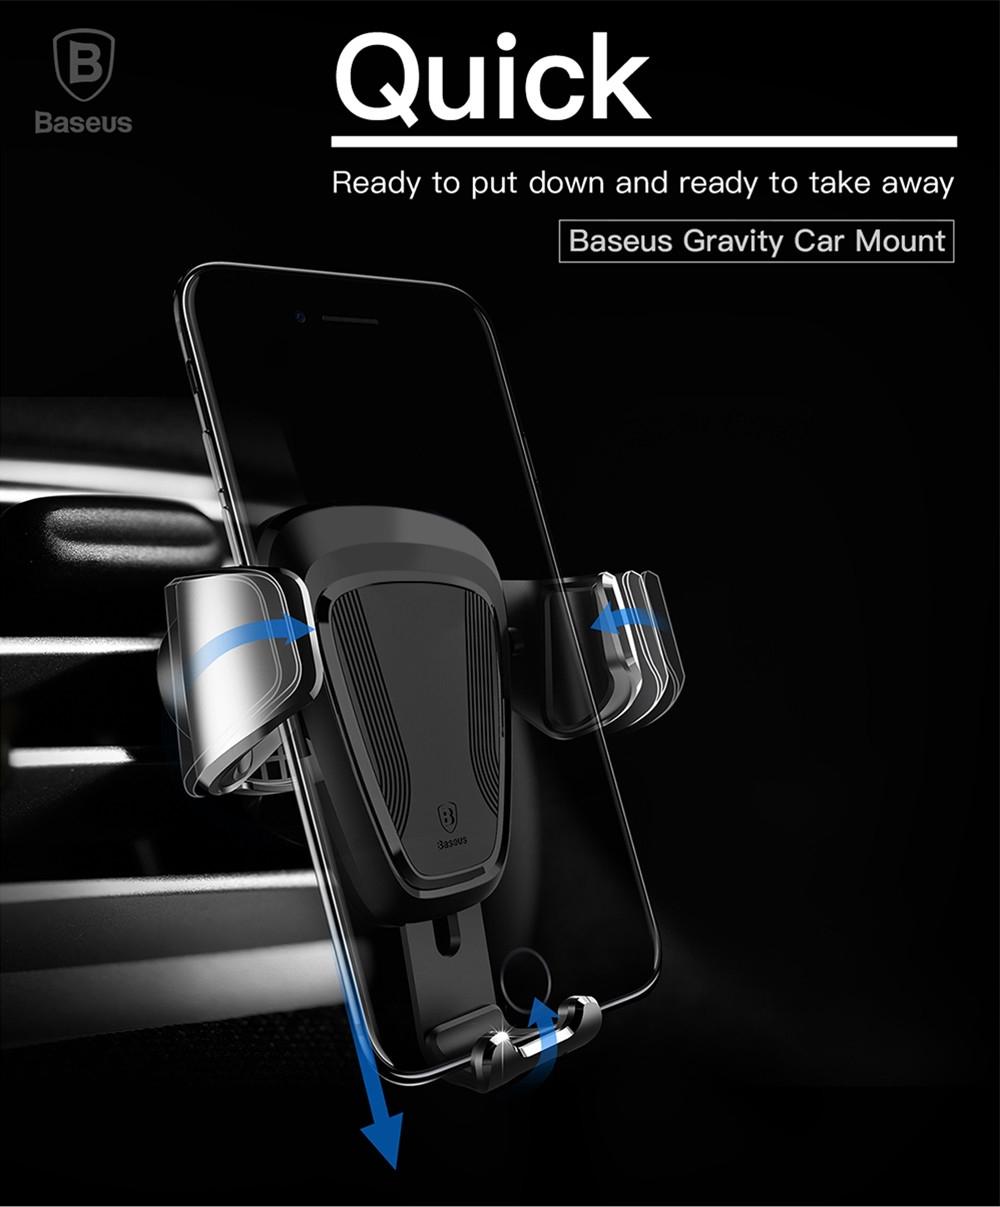 Baseus Gravity Air Vent Car Mount 360 Degree Rotation Phone Holder Cradle